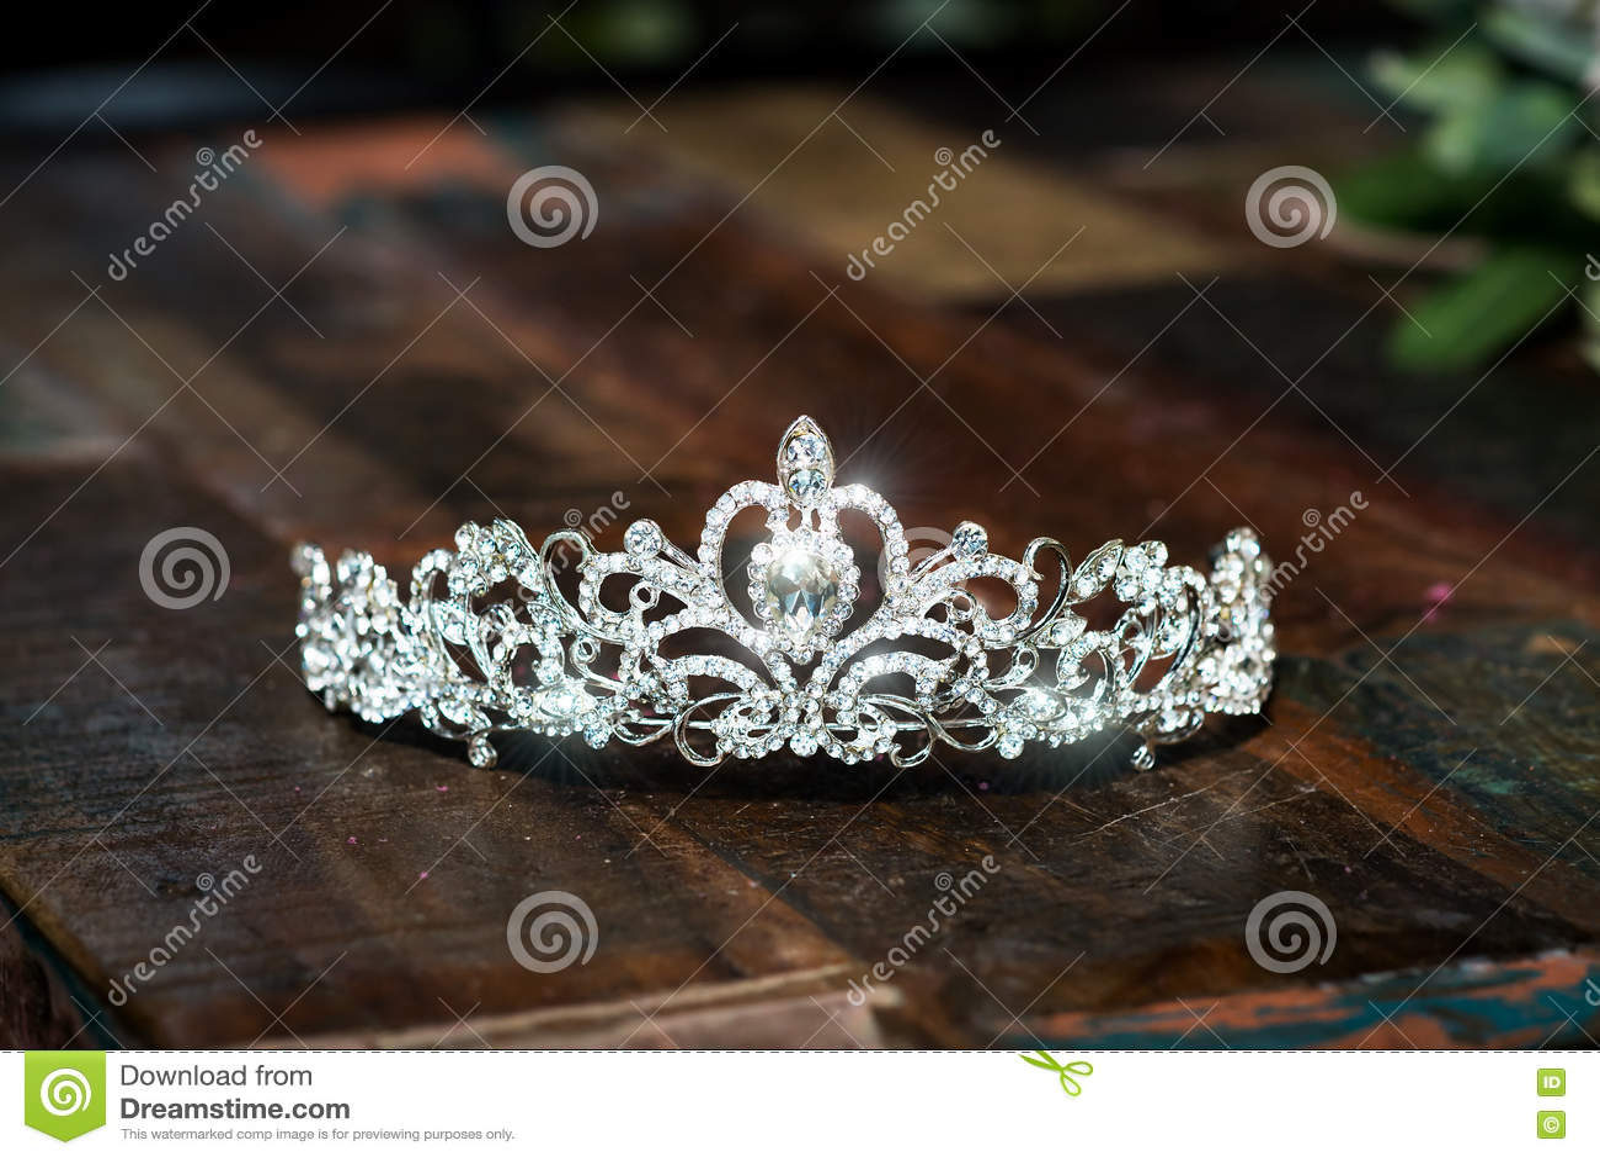 Tiara, Diademhochzeitskrone Kostbares LuxusZubehör